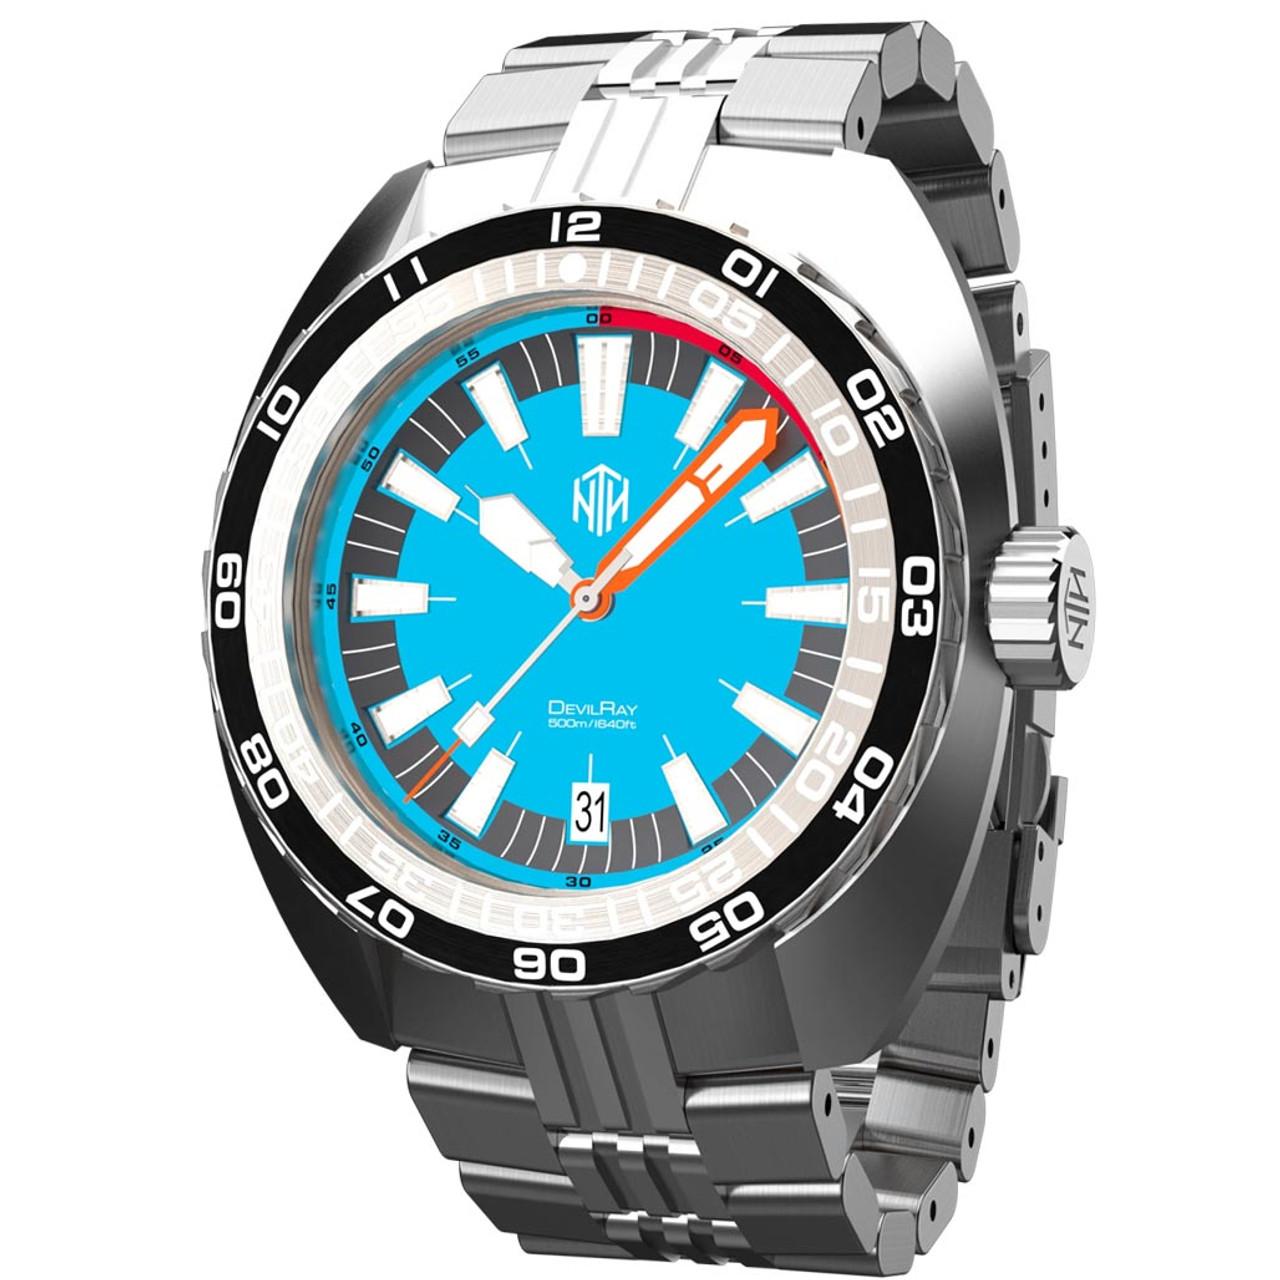 nth-mens-dive-watch-ww-nth-drtd-1__86830.1630825243.jpg